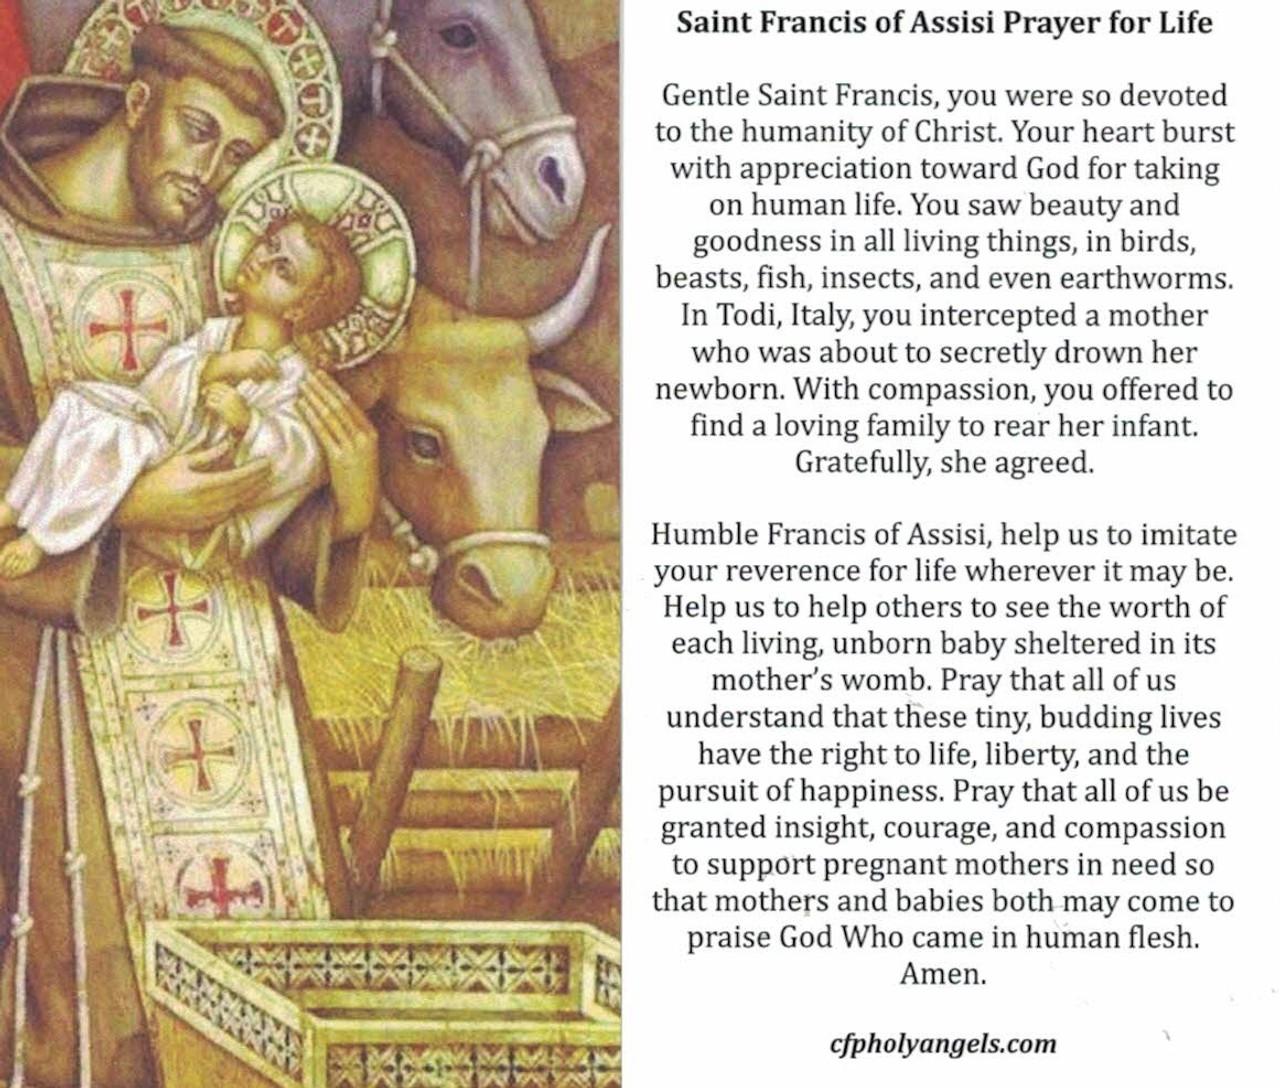 Saint Francis of Assisi Prayer for Life Prayer CArd